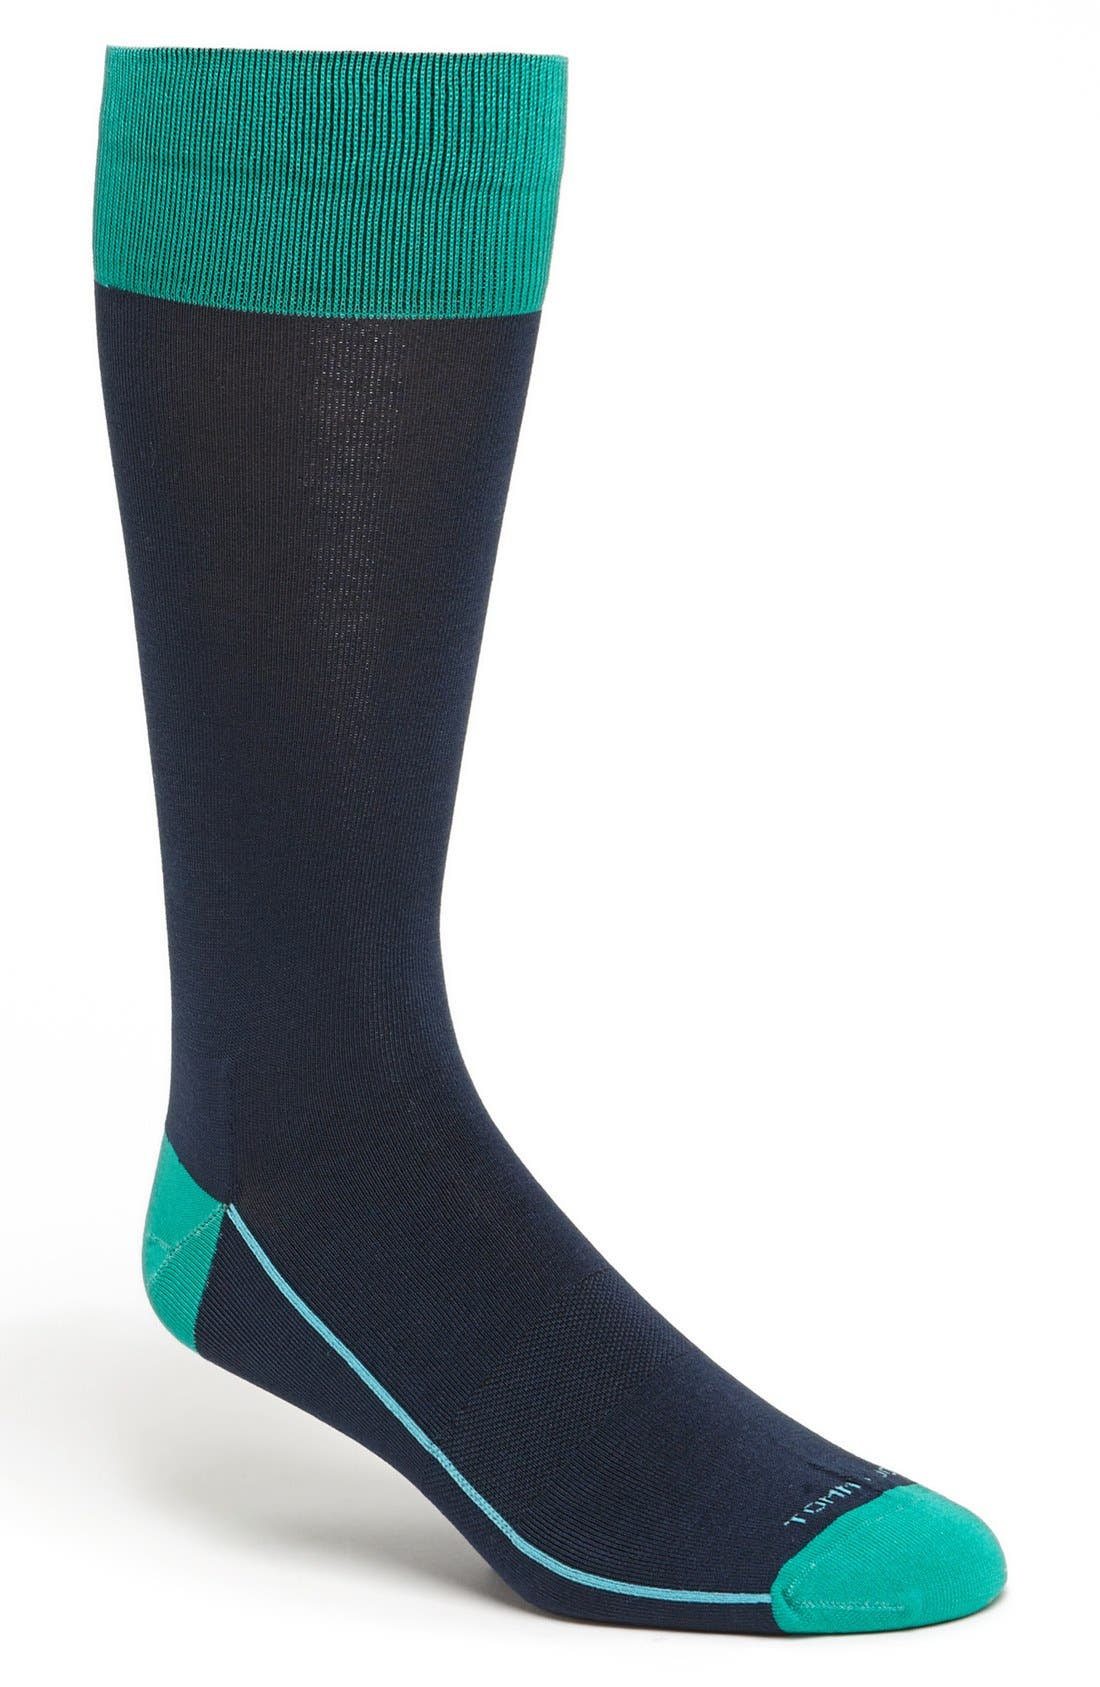 Alternate Image 1 Selected - Tommy John Solid Cotton Blend Socks